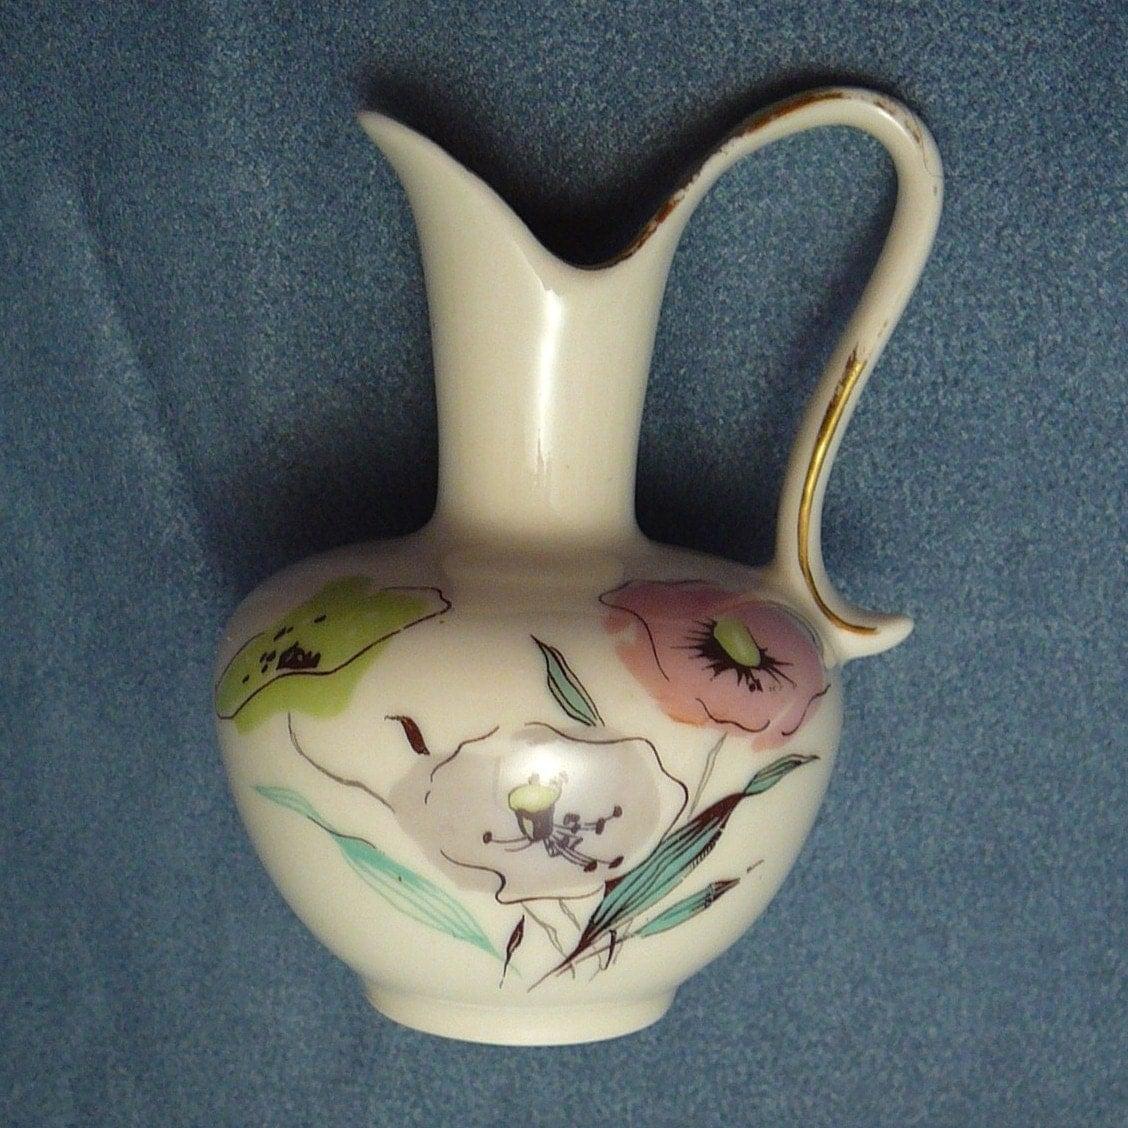 vintage rosenthal kronach vase pink green grey poppies bavaria. Black Bedroom Furniture Sets. Home Design Ideas